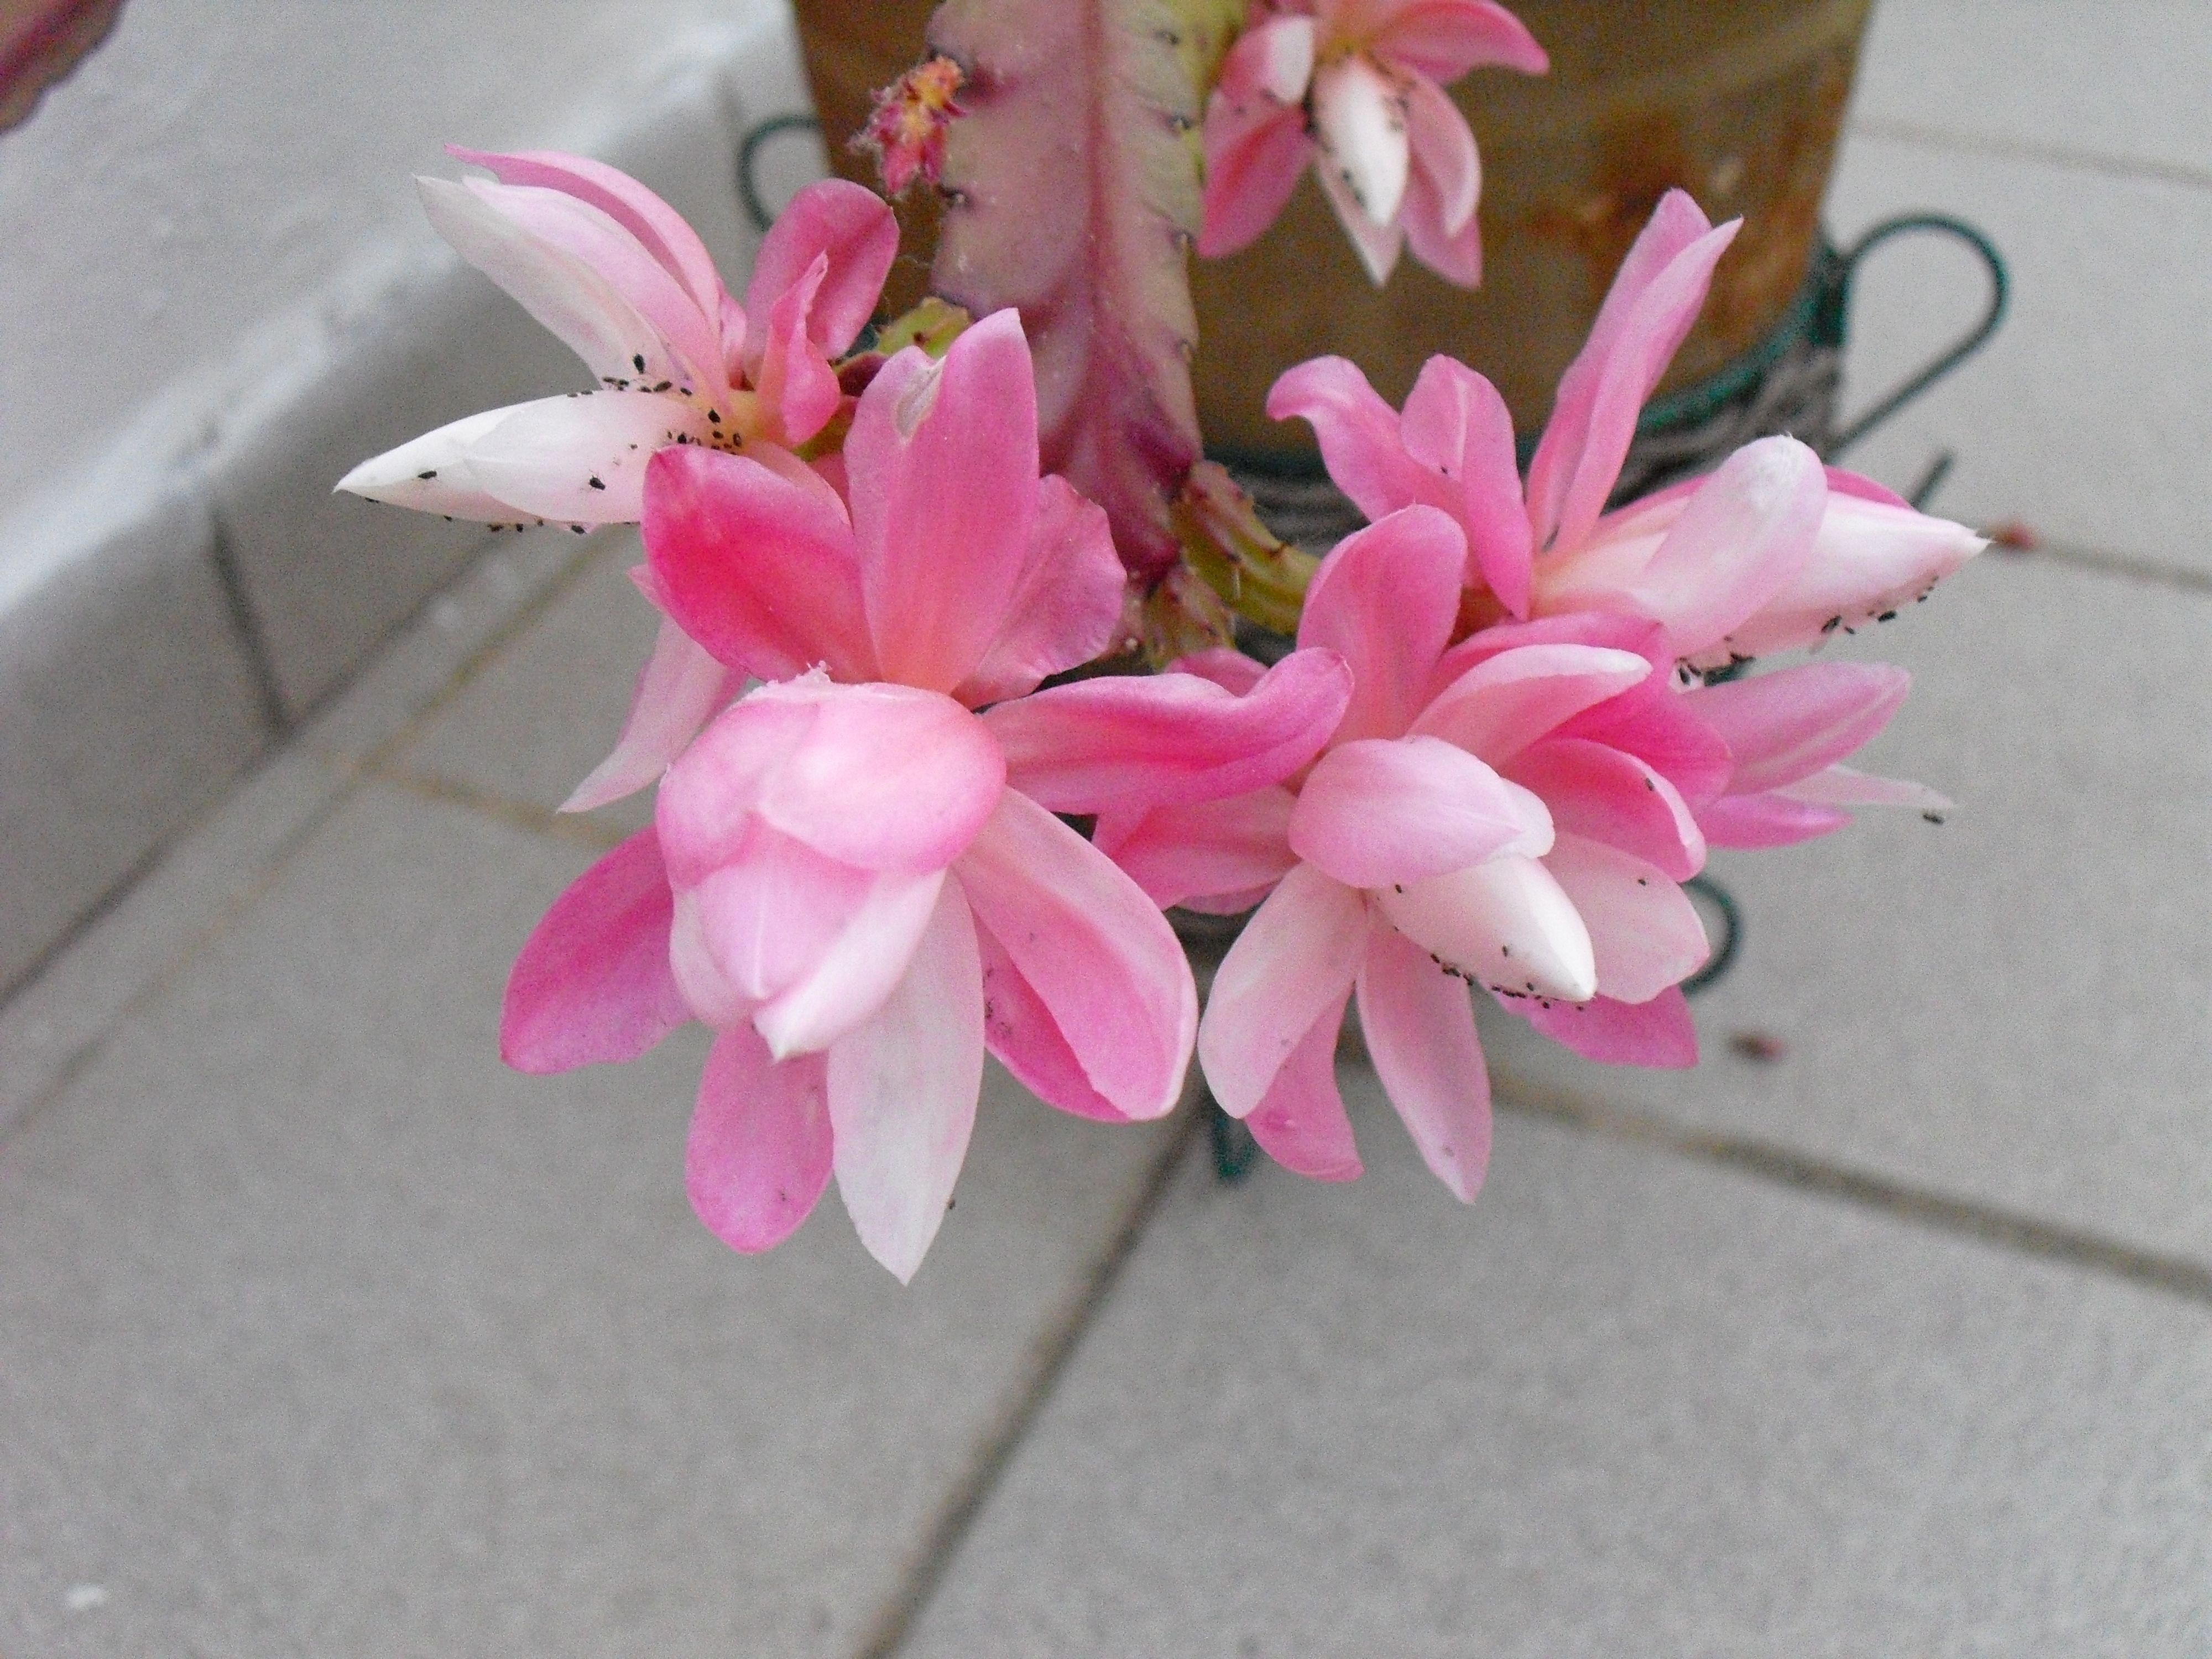 Cactus orqu dea pluma de santa teresa mis plantas del for Santa teresita planta